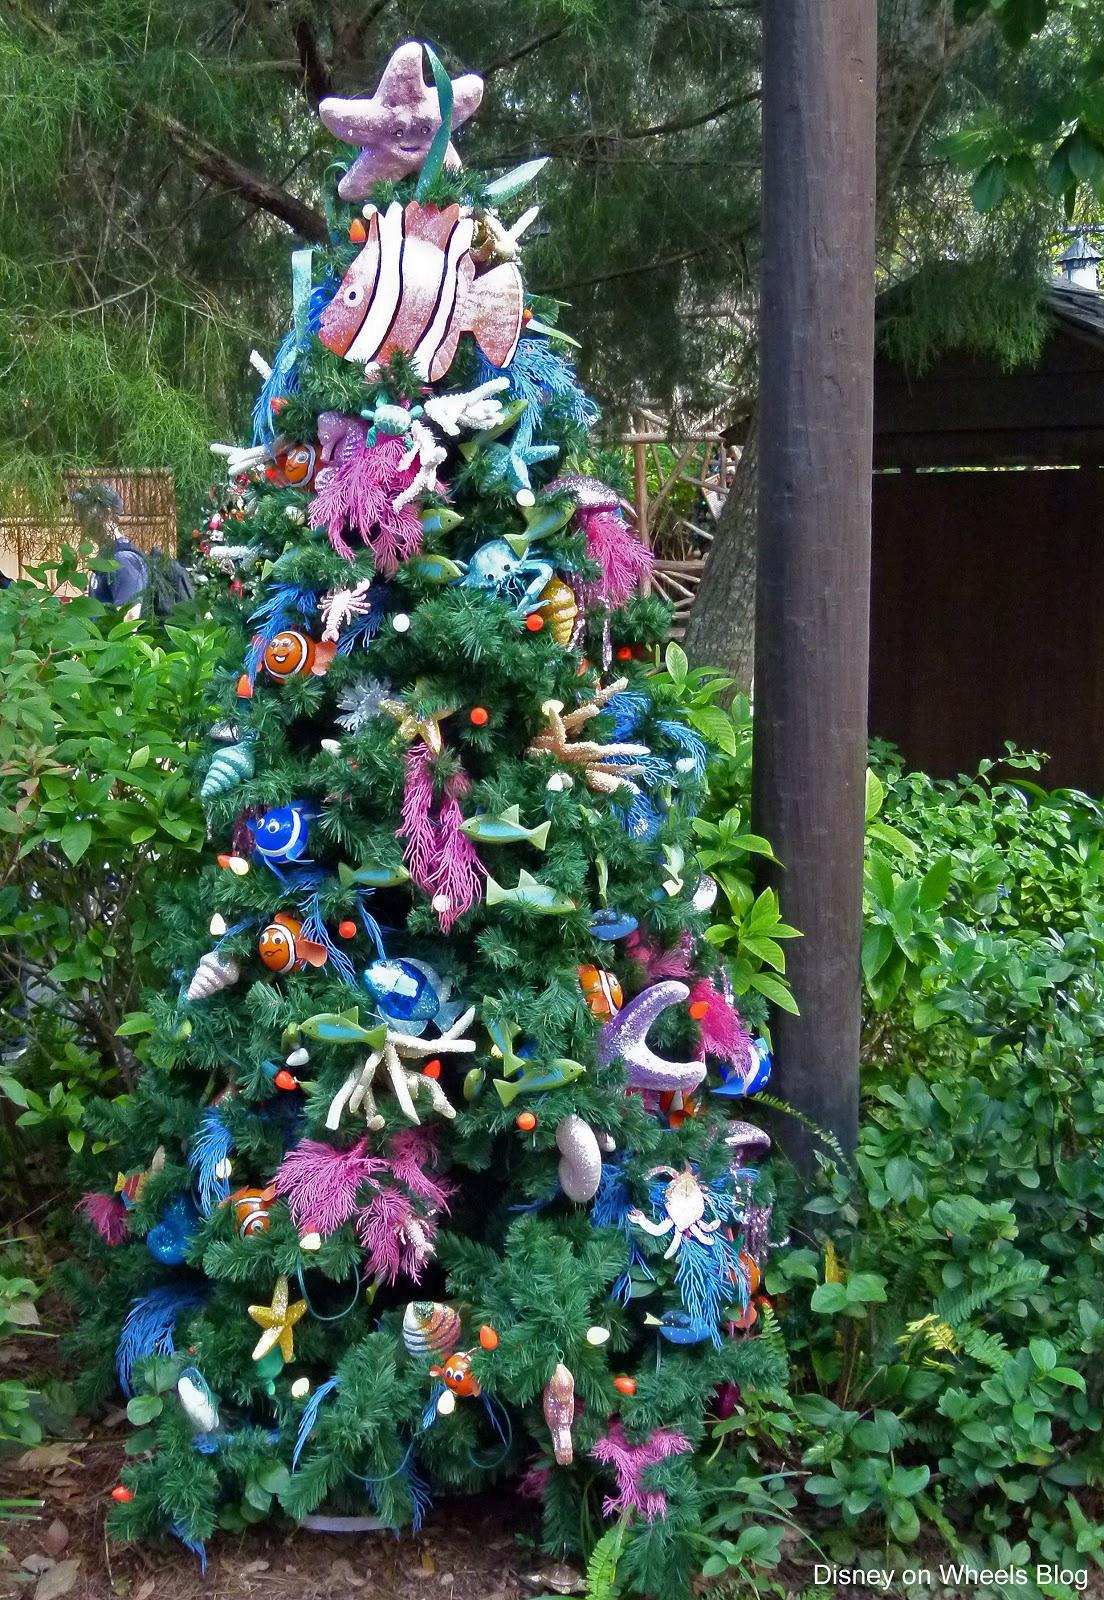 finding nemo - Finding Nemo Christmas Decorations